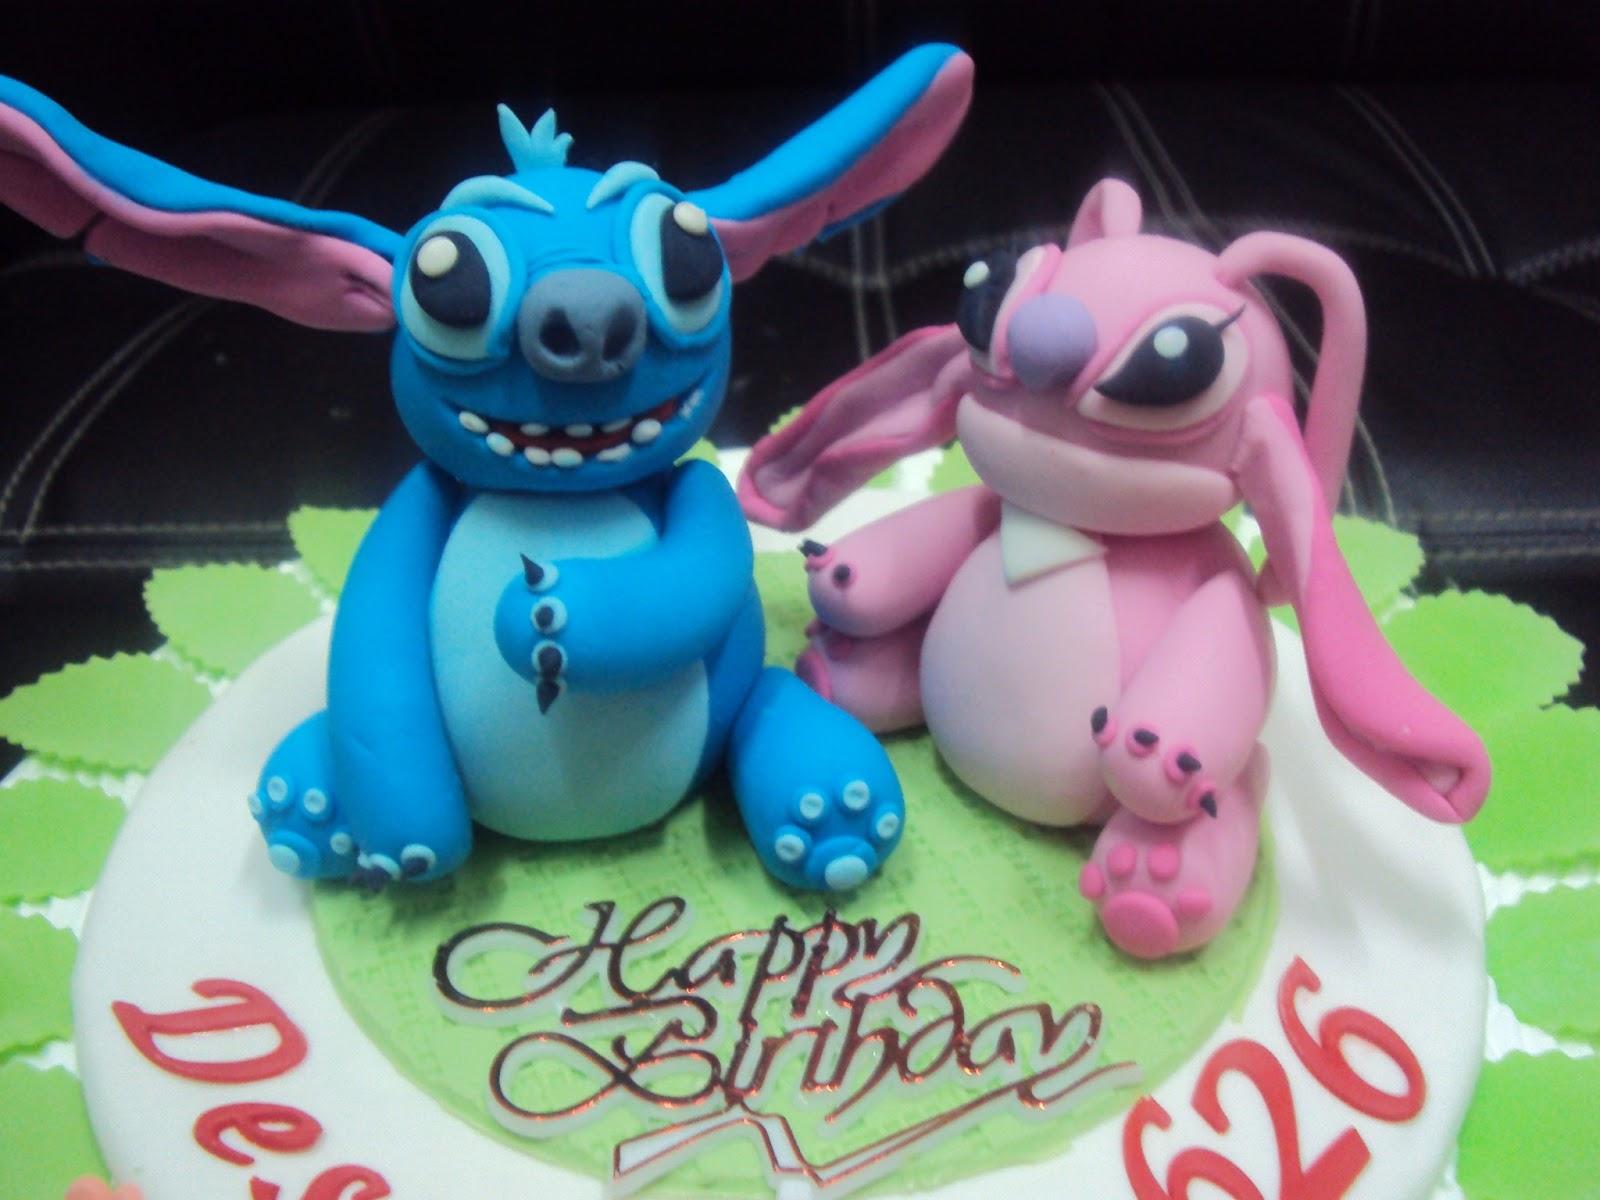 Lmis Cakes Cupcakes Ipoh Contact 012 5991233 Fondant Cake